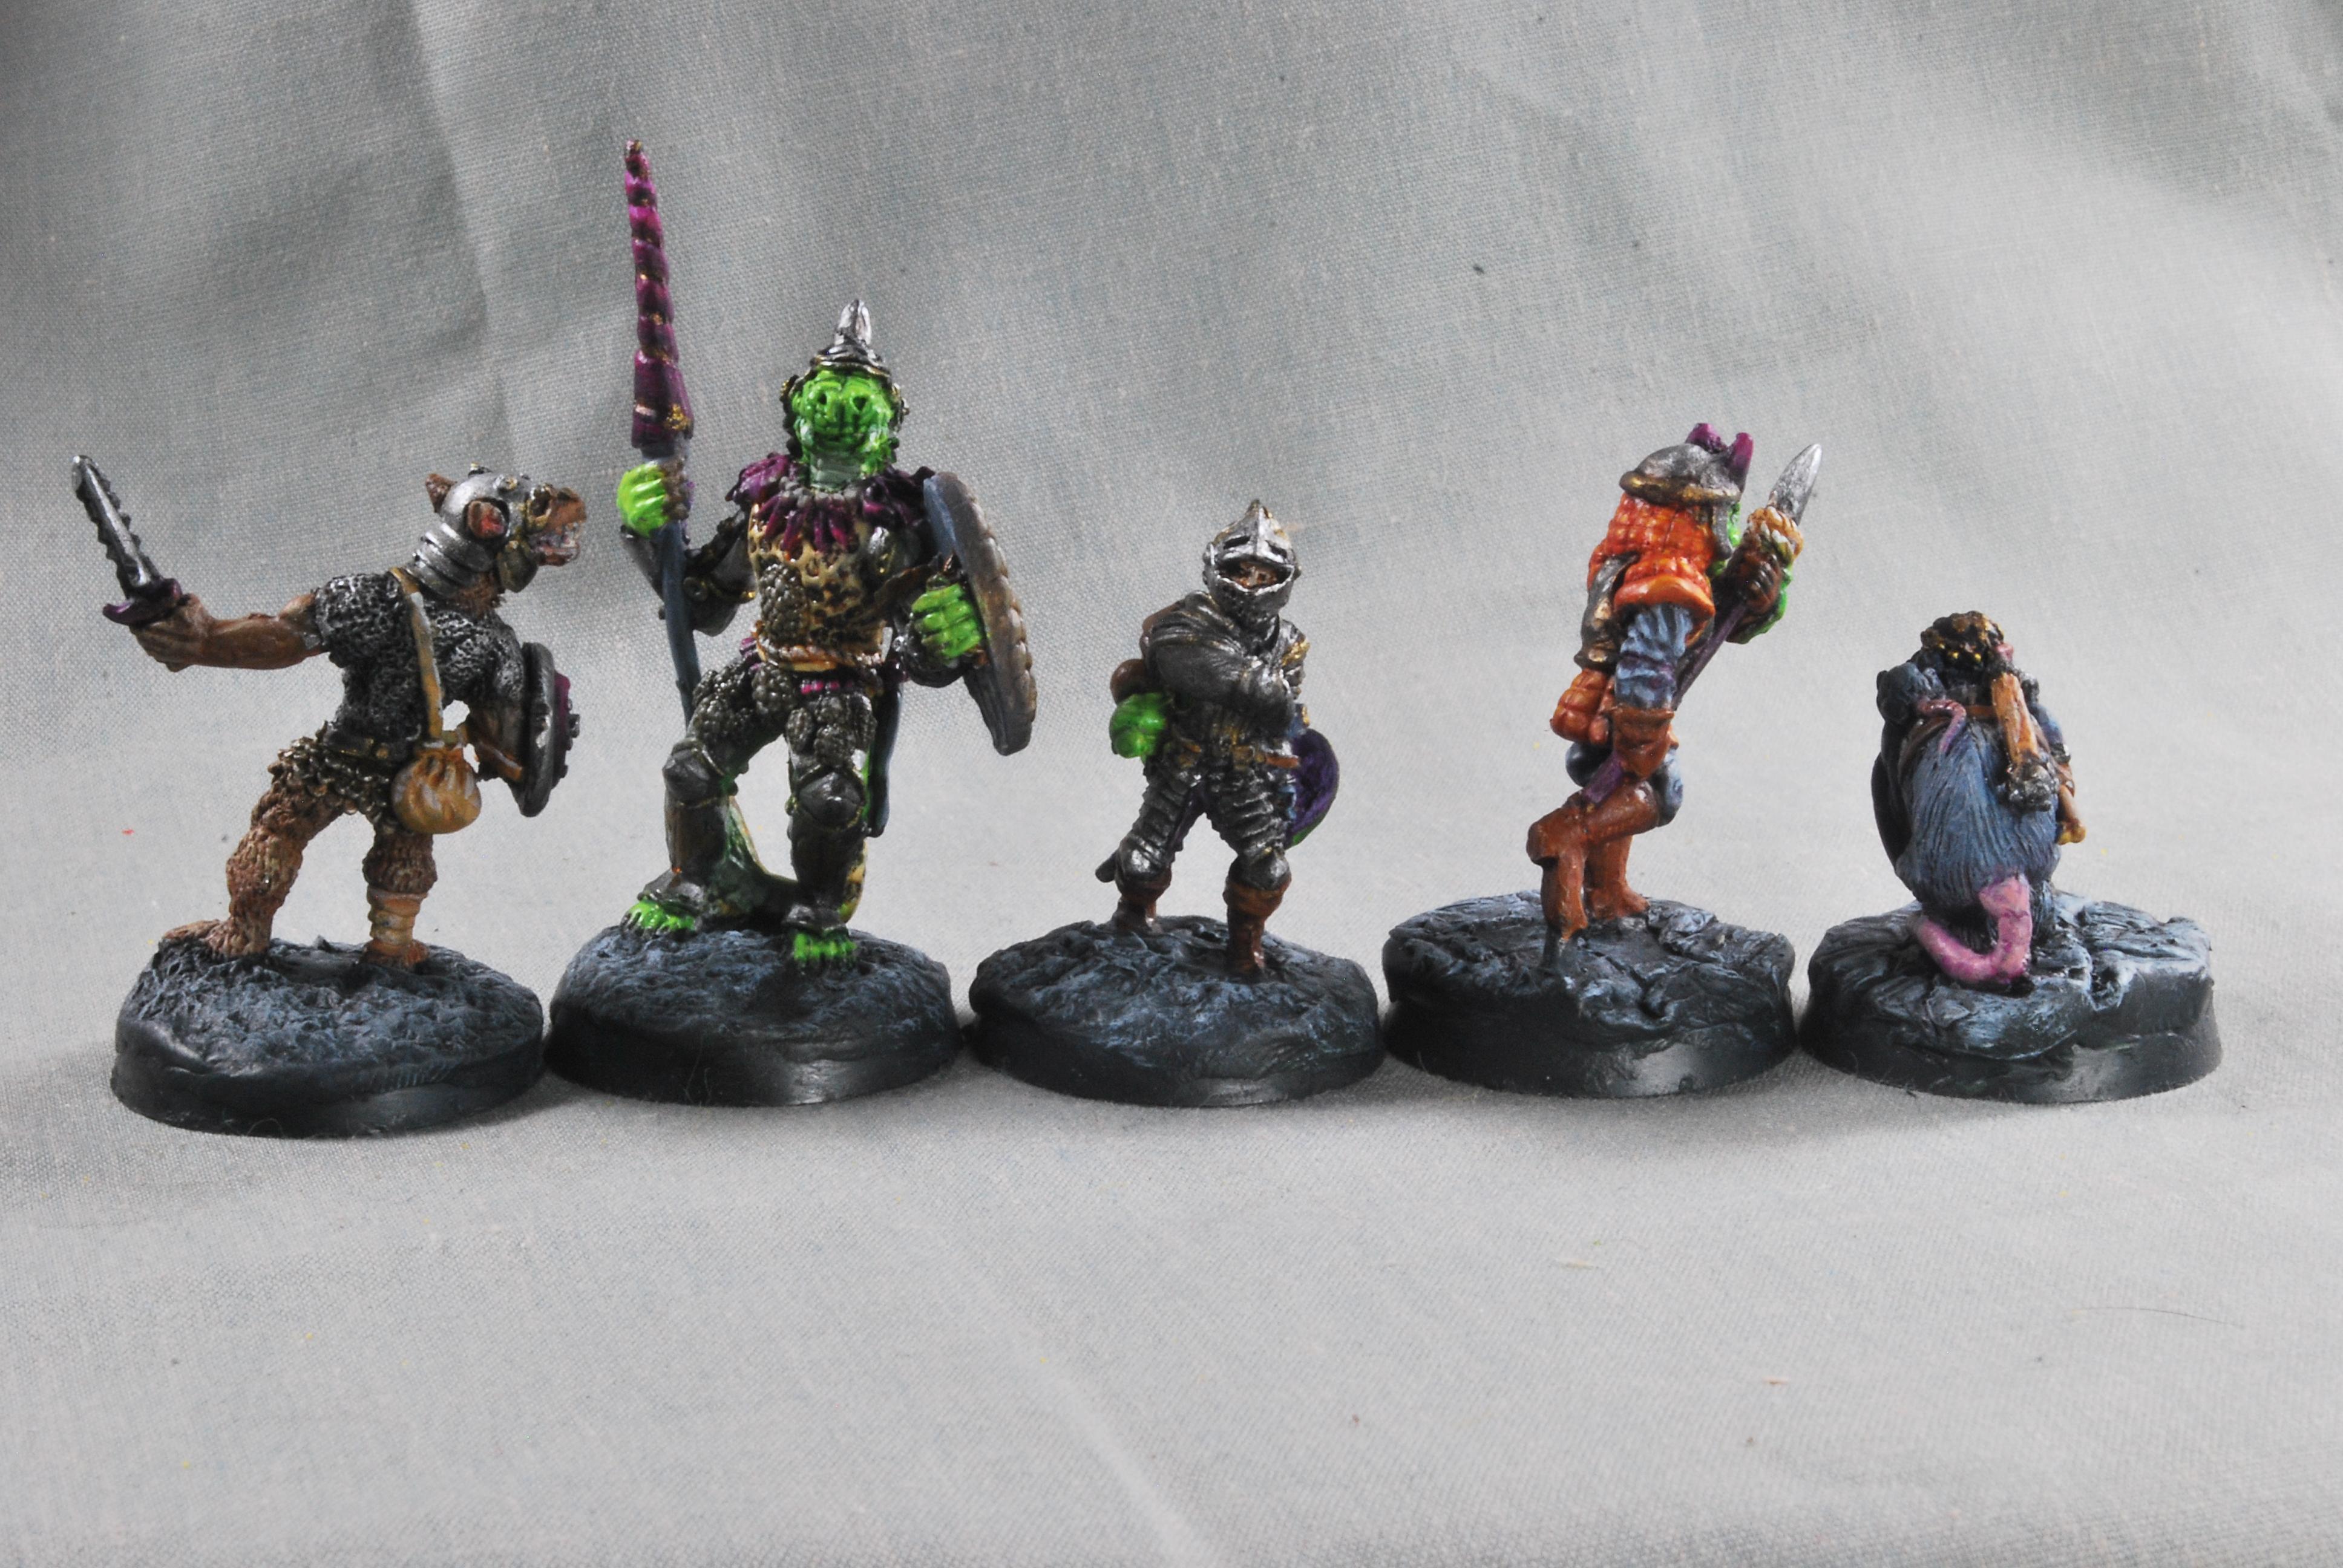 Adventurers, Dungeons And Dragons, Gnoll, Grenadier, Human, Lizardmen, Ratfolk Oldhammer